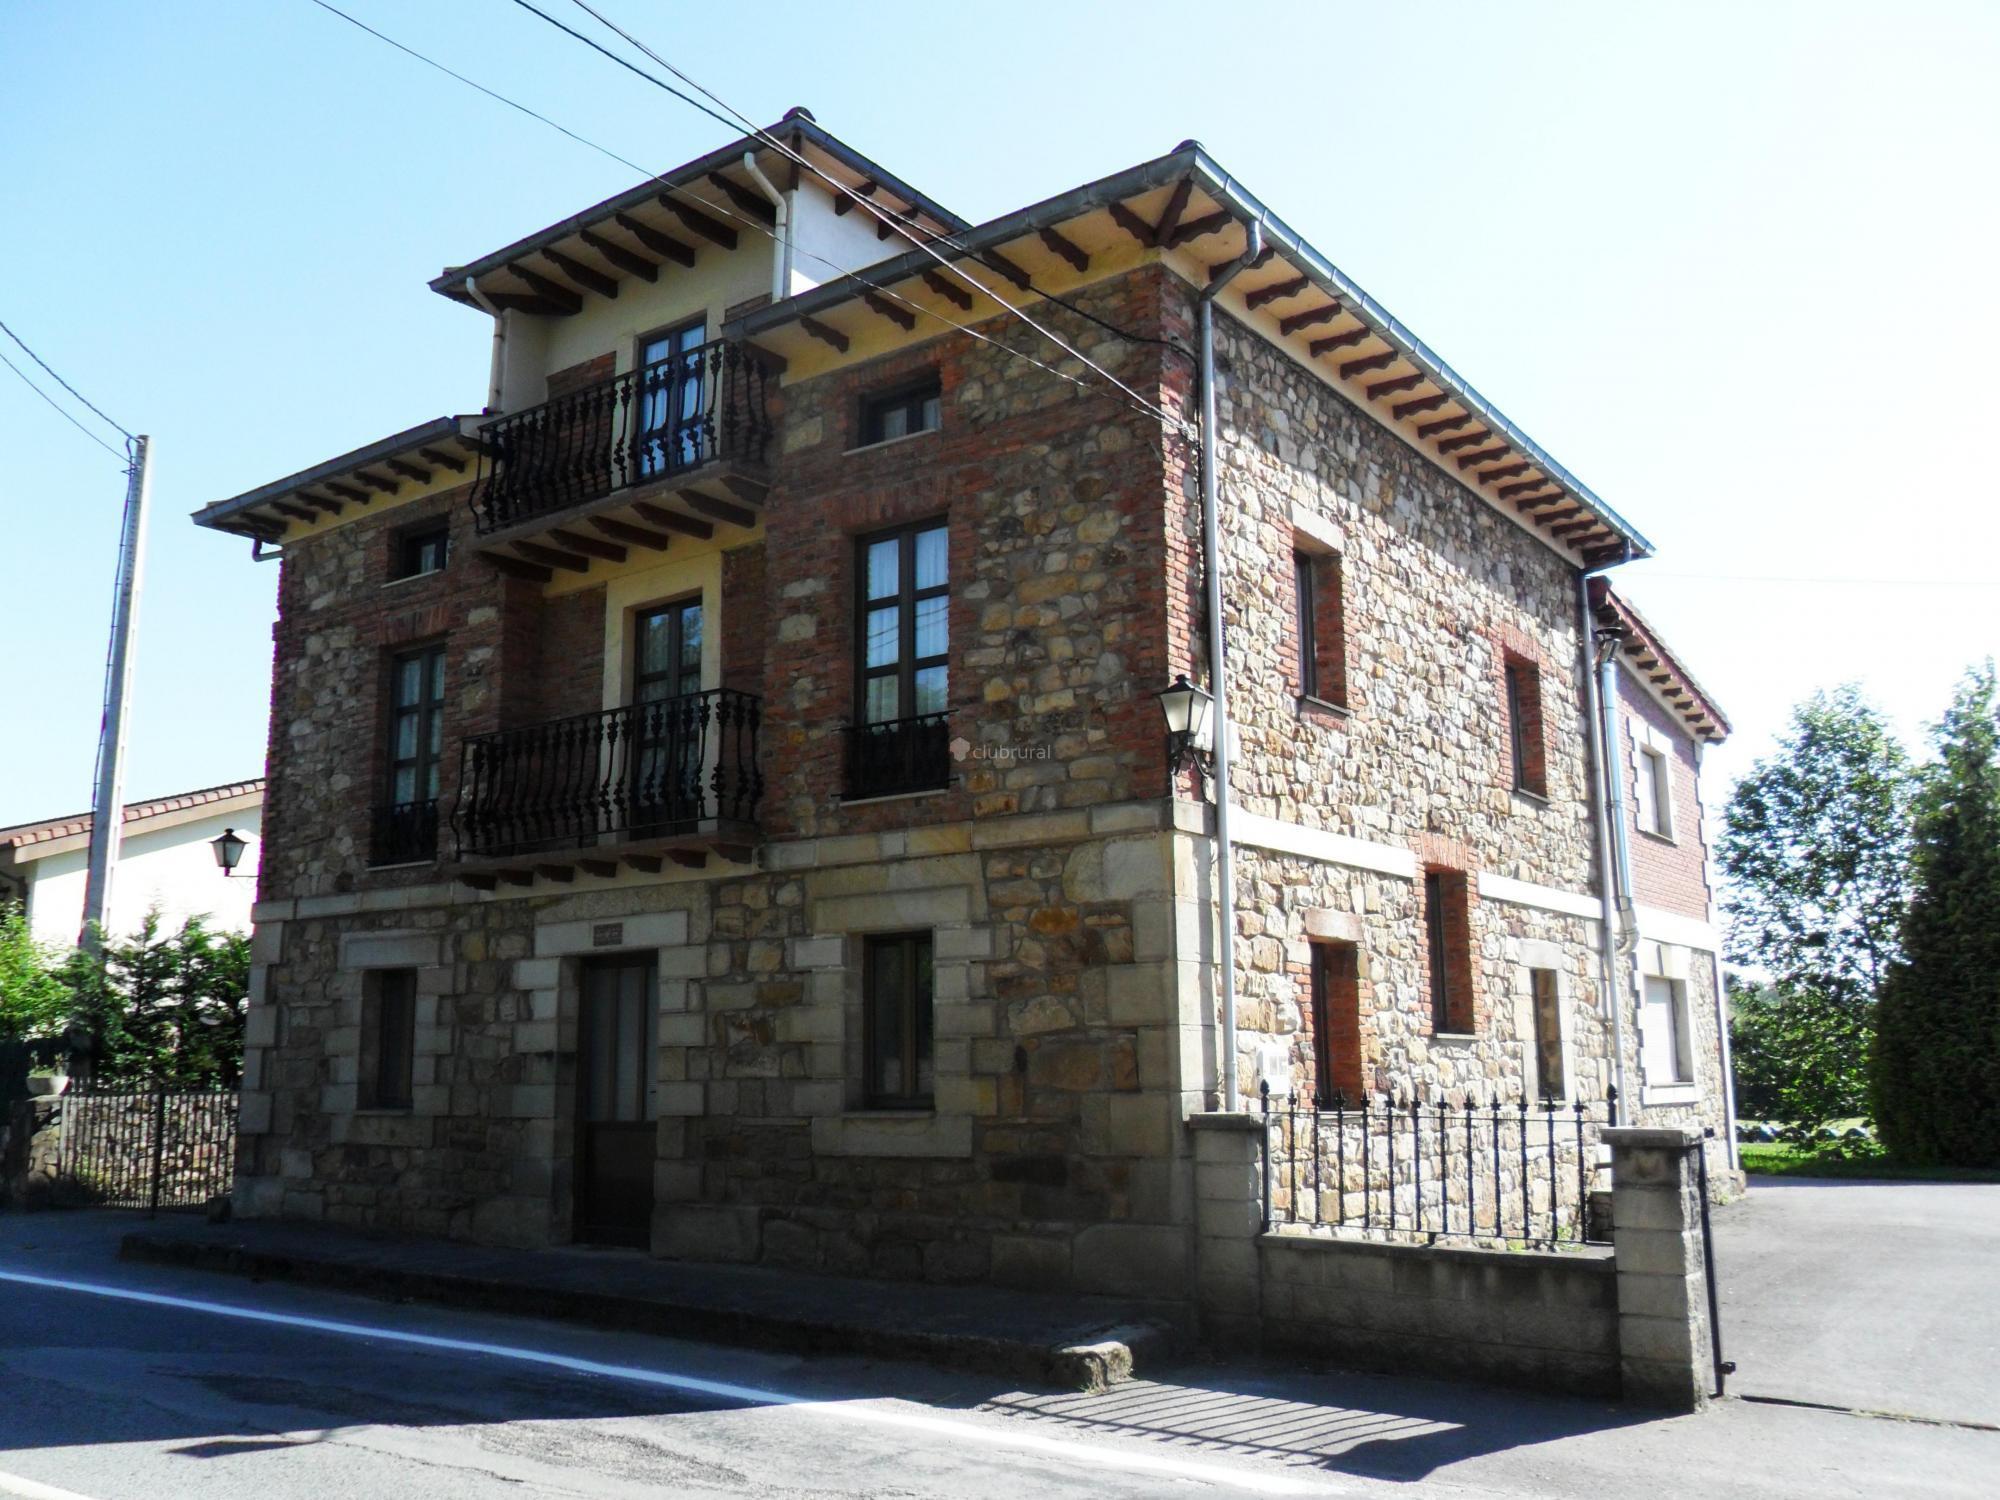 Fotos de casa la bolera cantabria quijano clubrural - Casas rurales cantabria alquiler integro ...